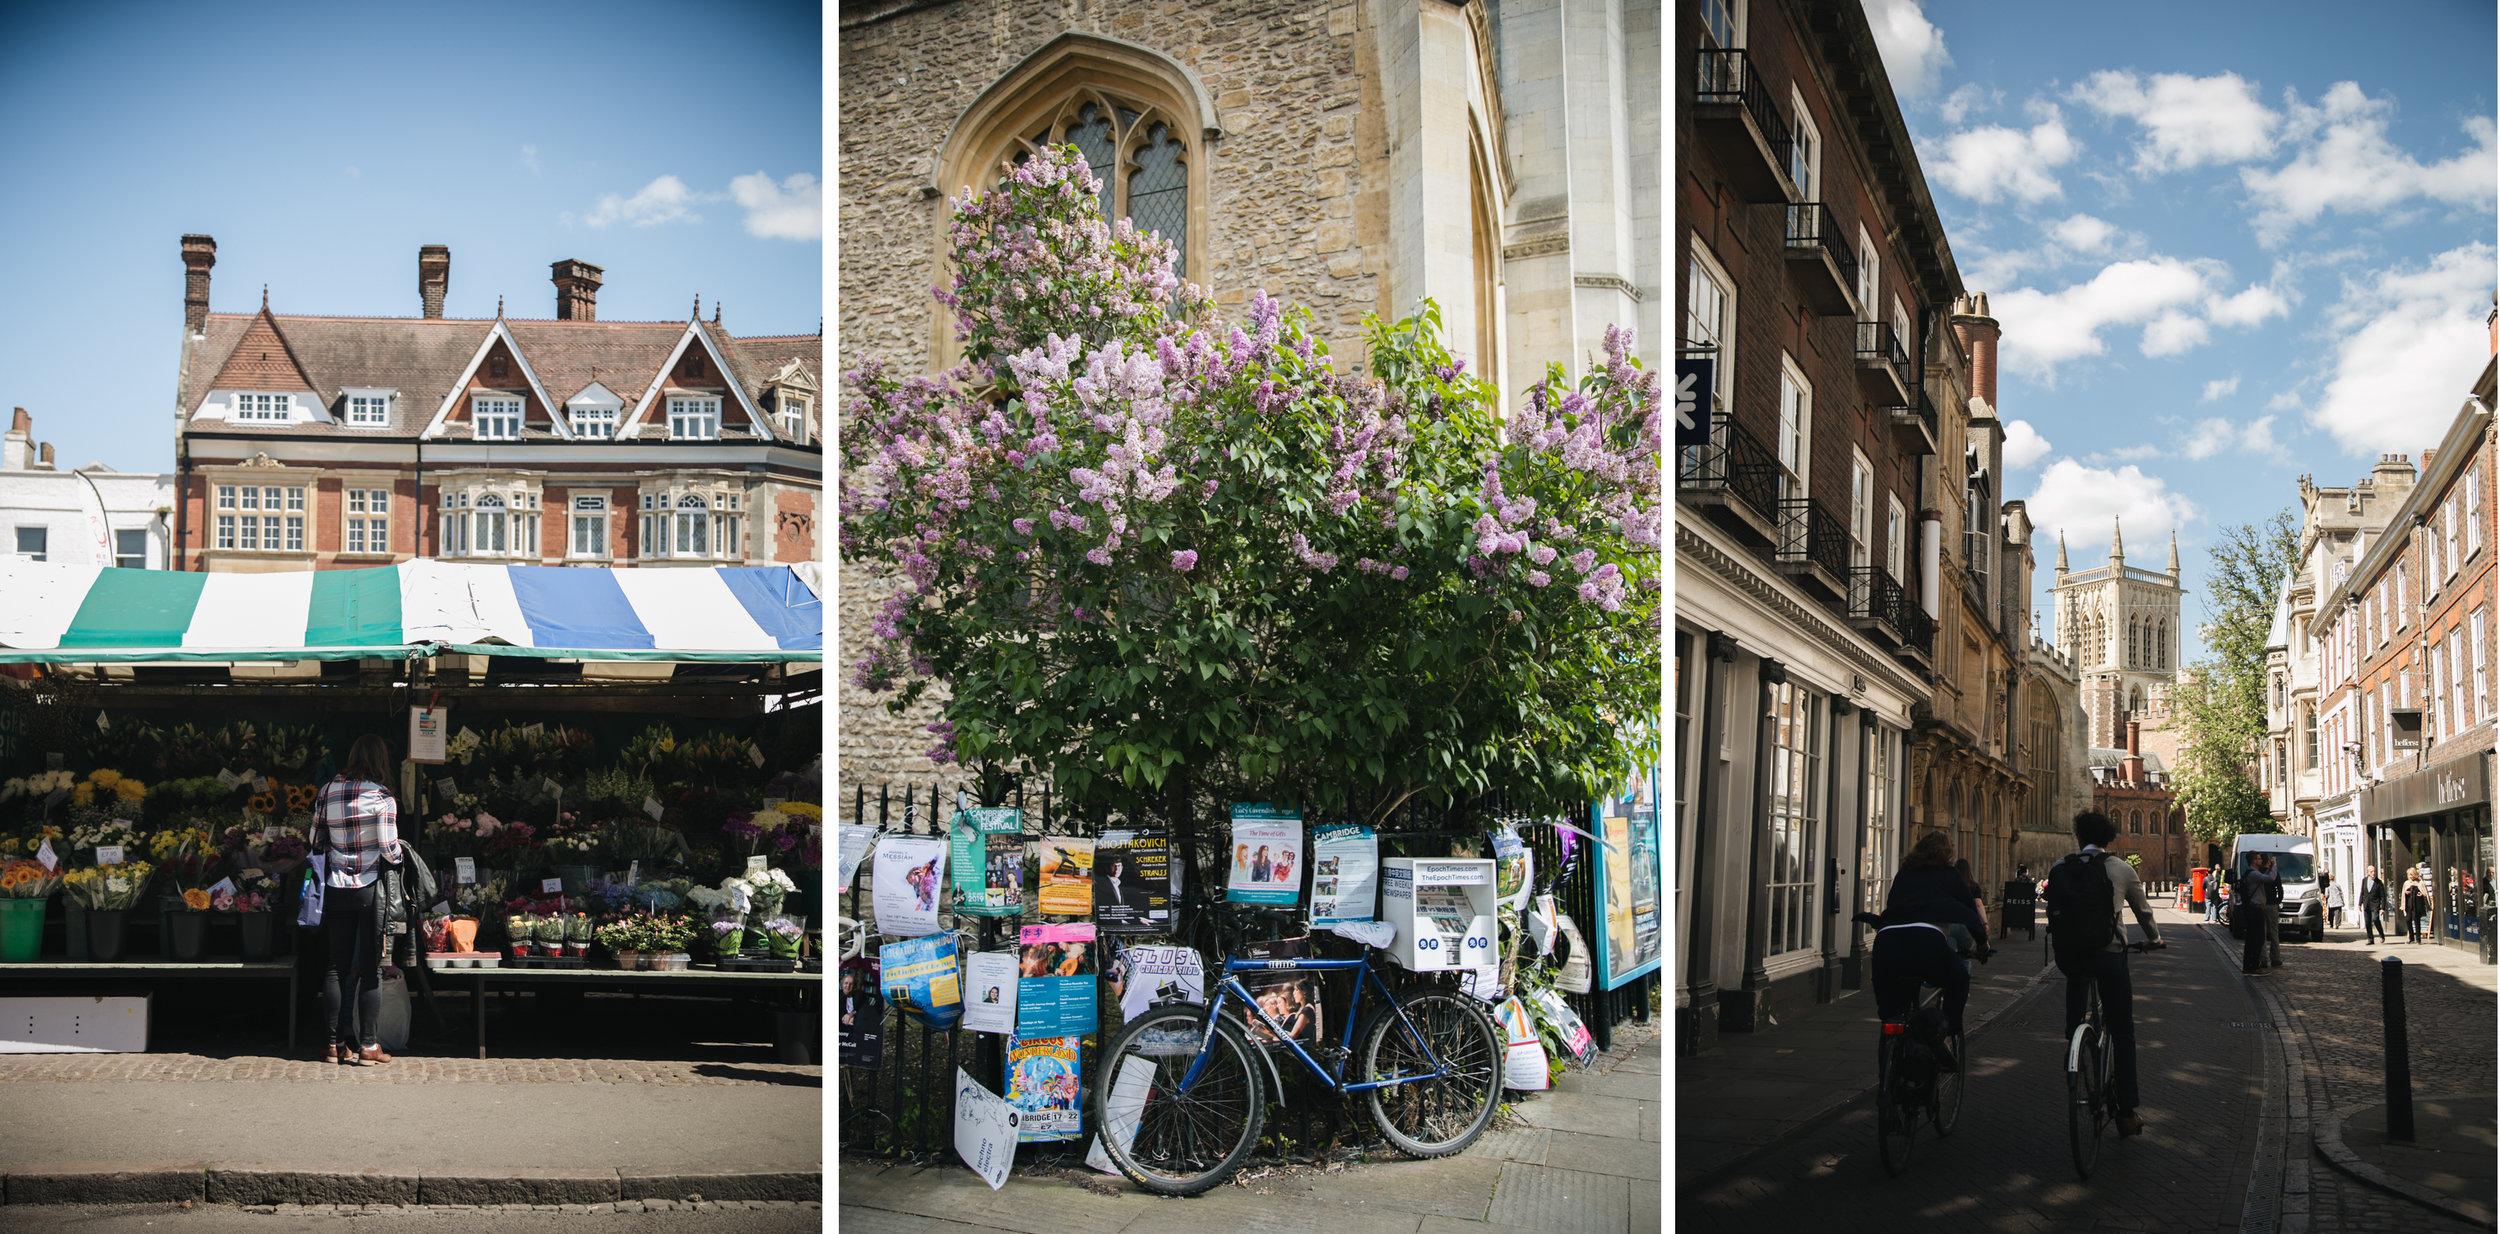 Cambridge-angleterre-visiter-voyage-que-faire.jpg